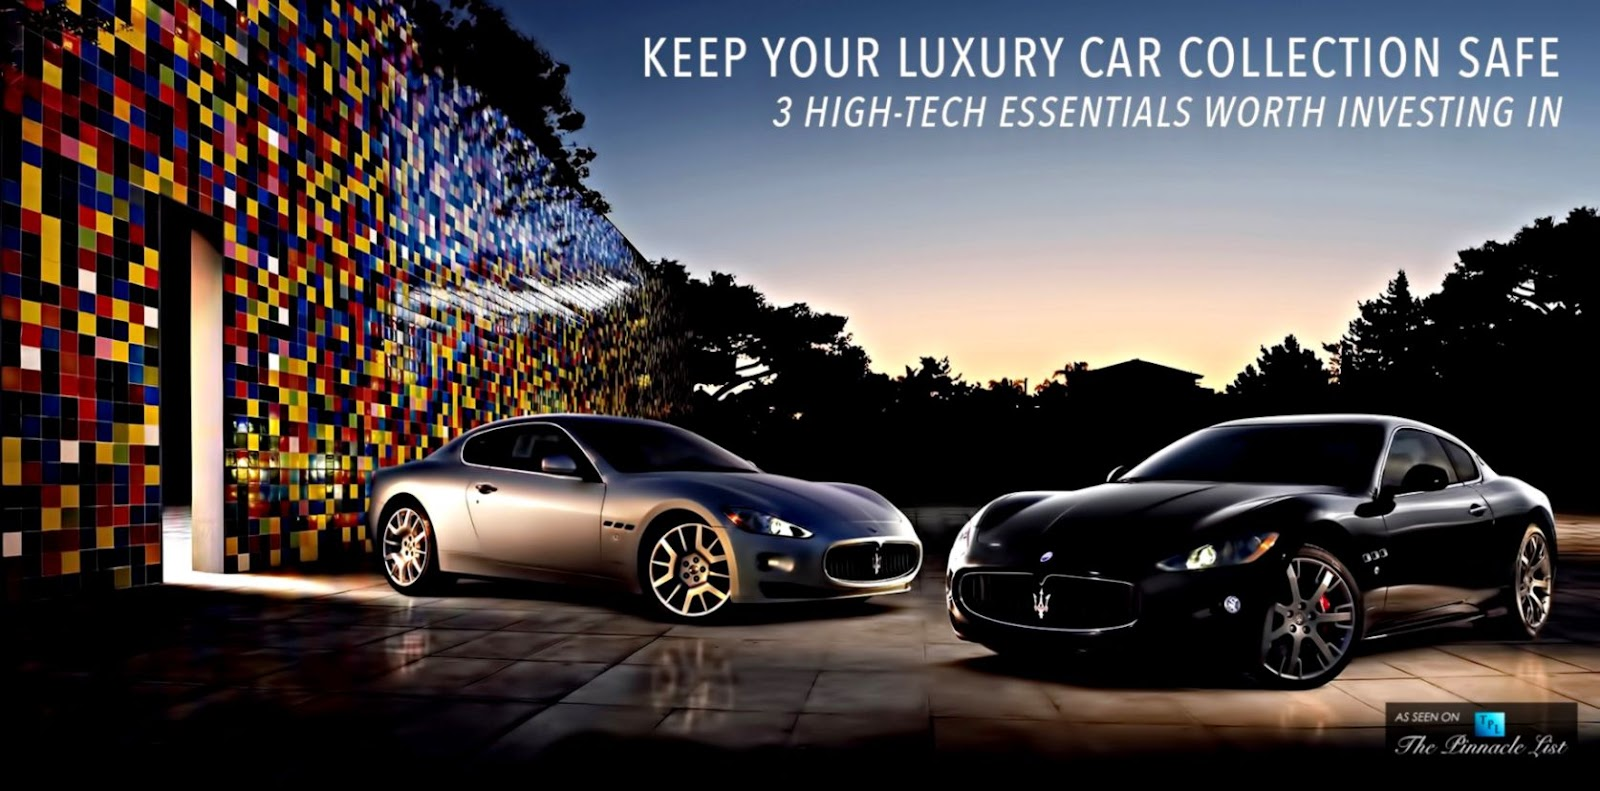 Luxury Cars  The Pinnacle List